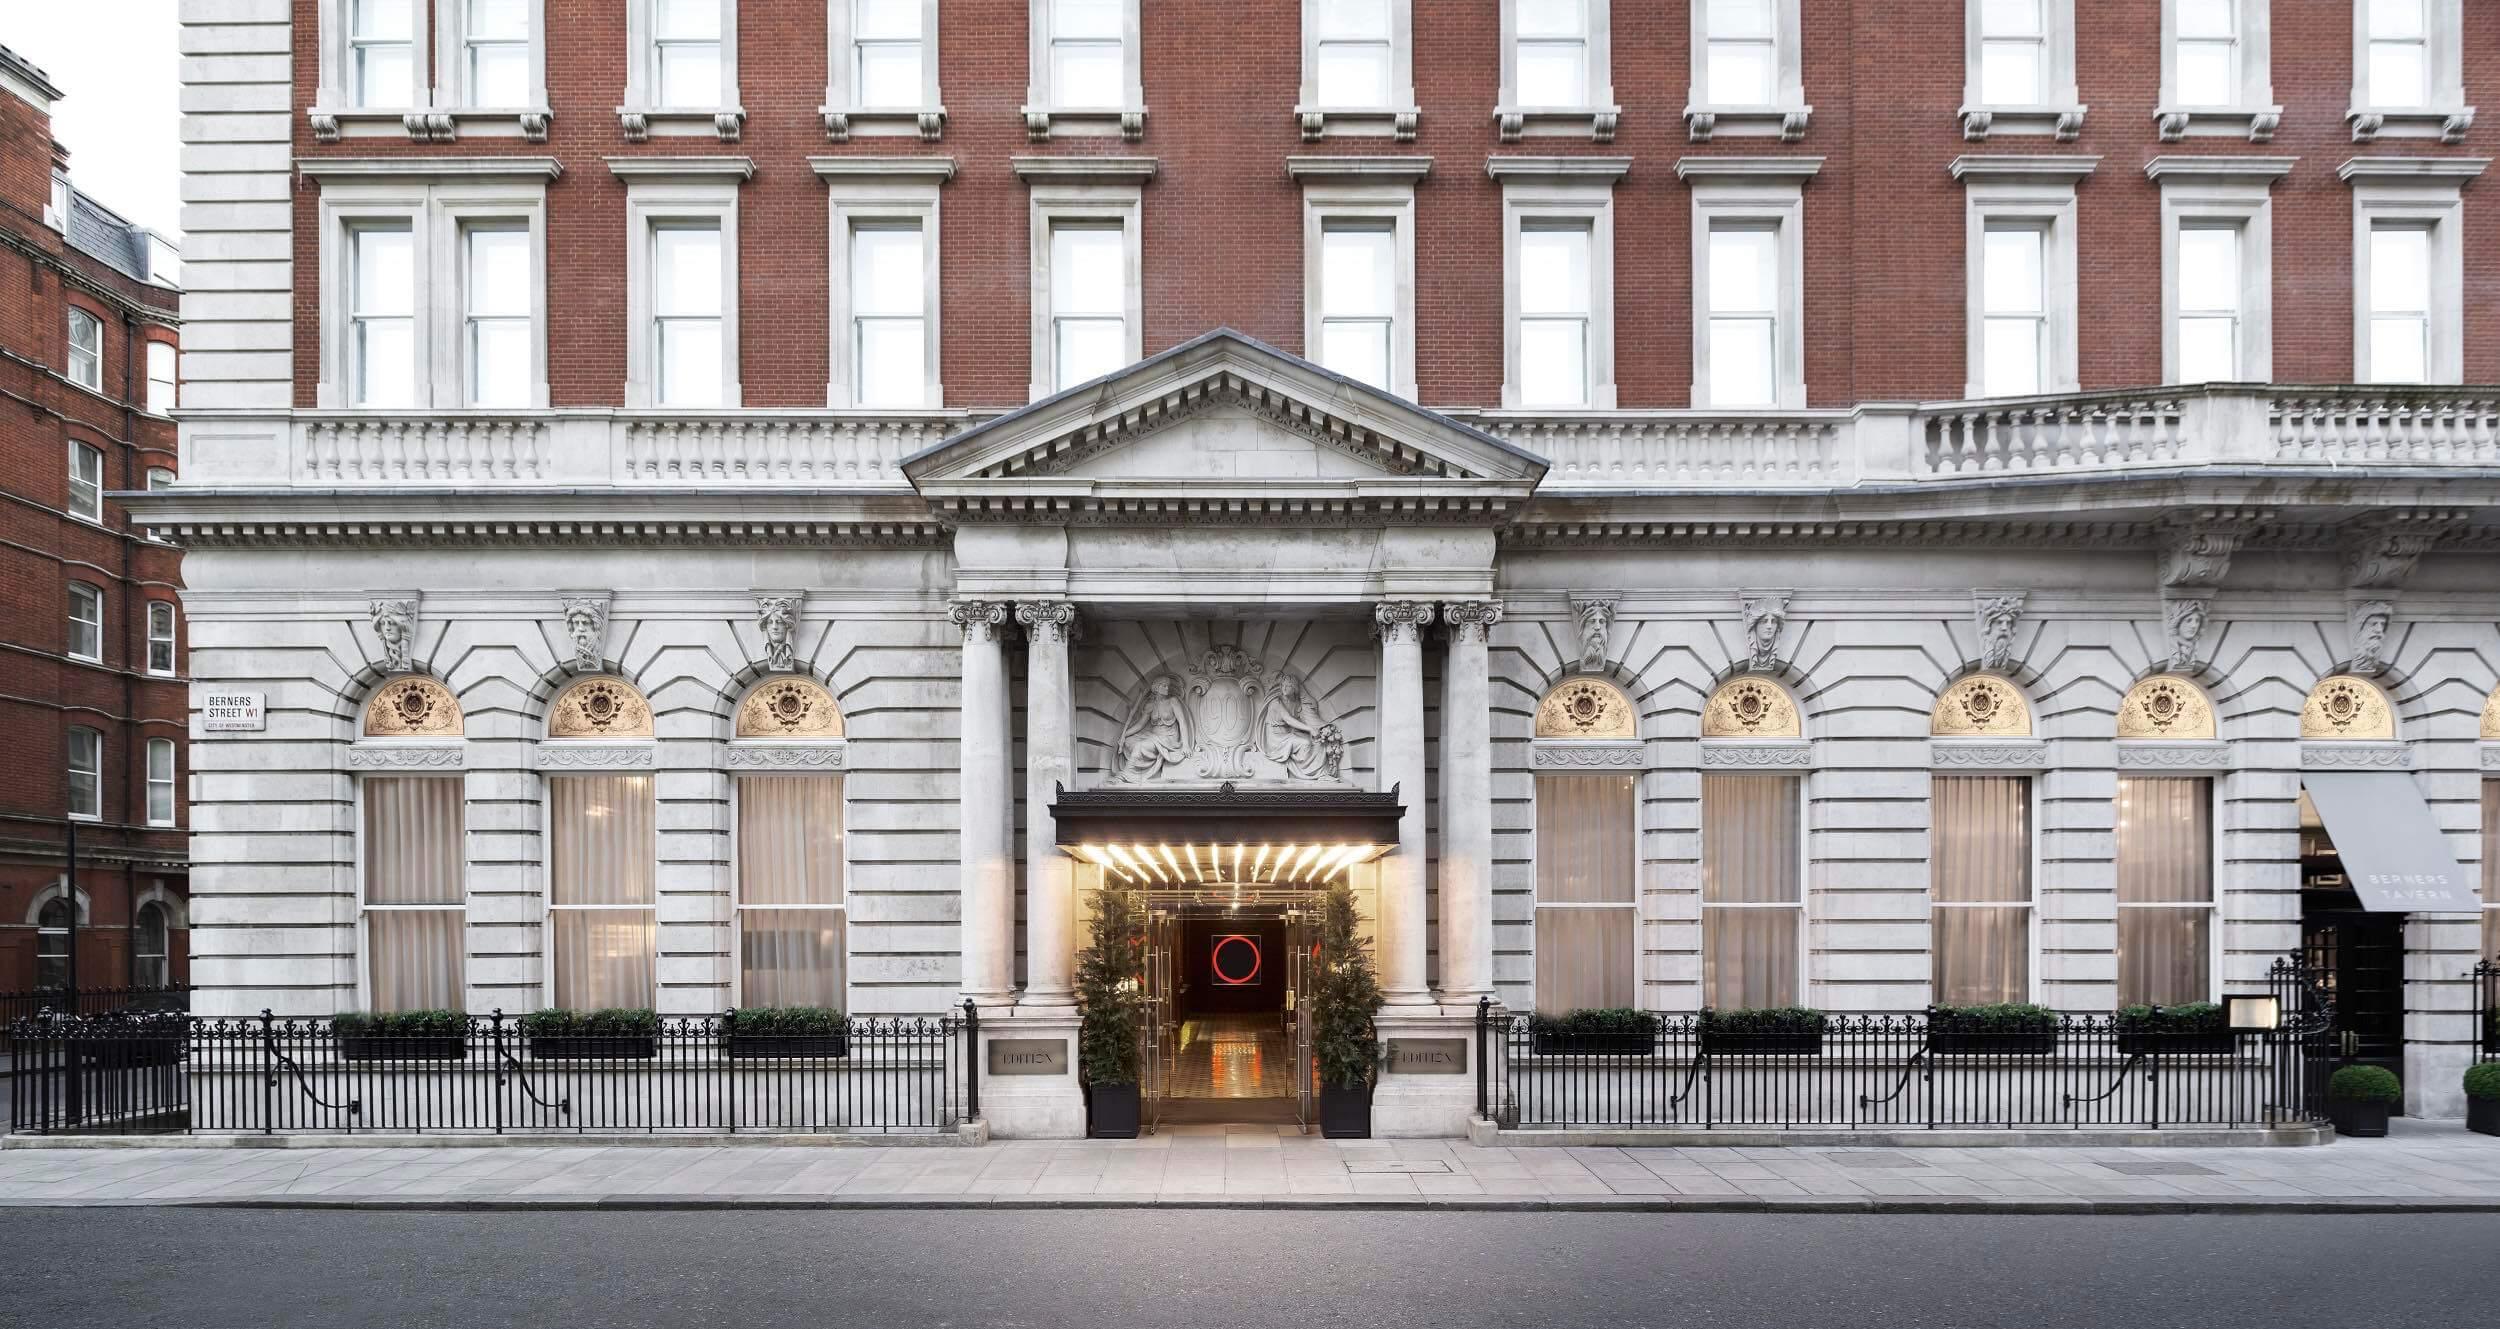 The London EDITION exterior - Please credit Nikolas Koenig